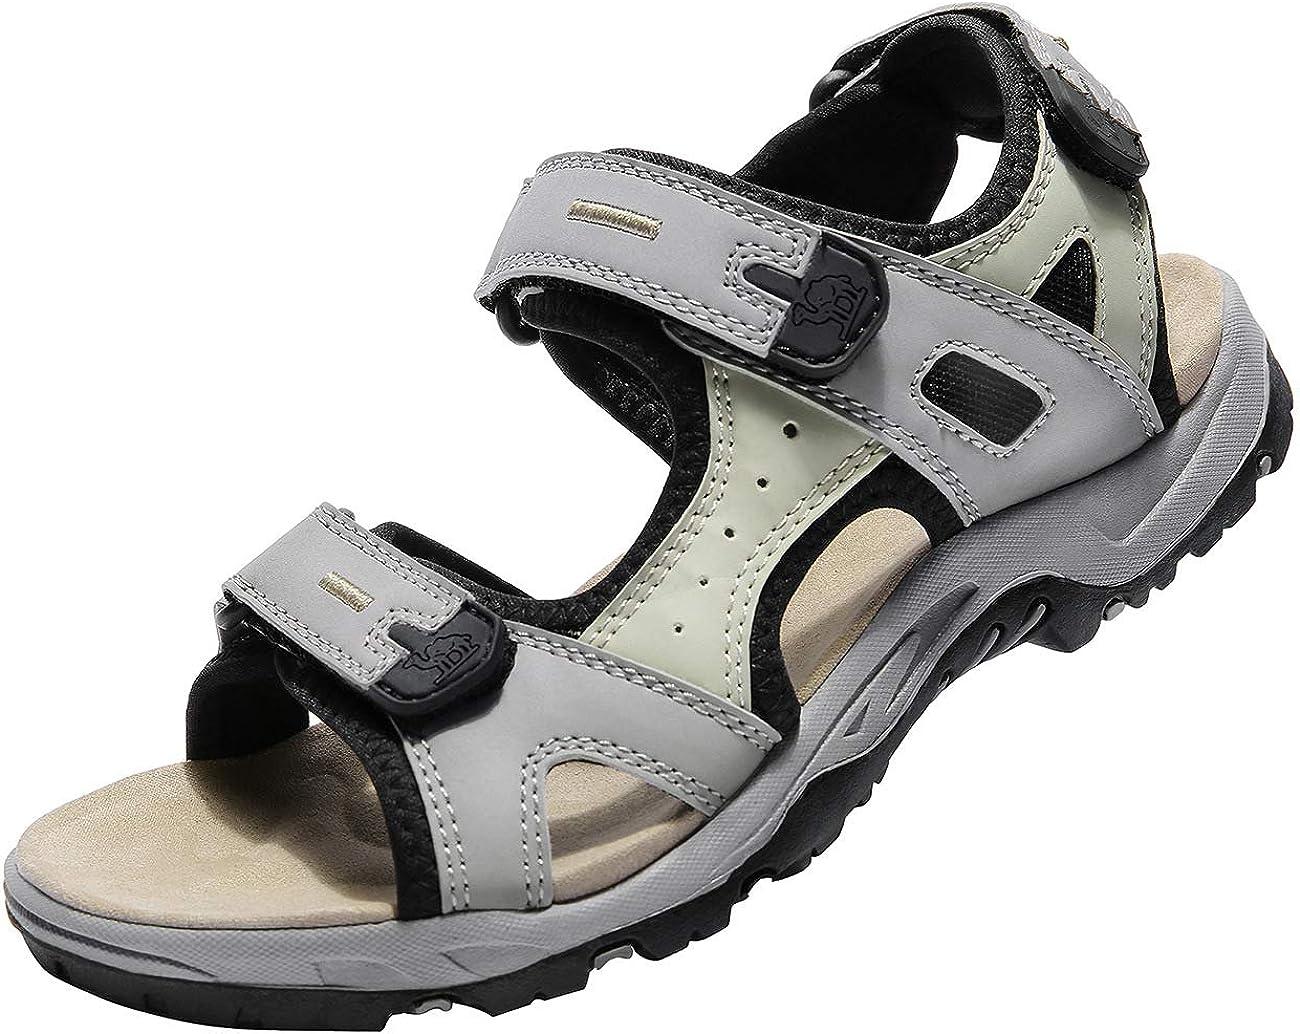 CAMEL CROWN Comfortable Hiking Sandals Popular overseas Waterproof Spor for Women Some reservation